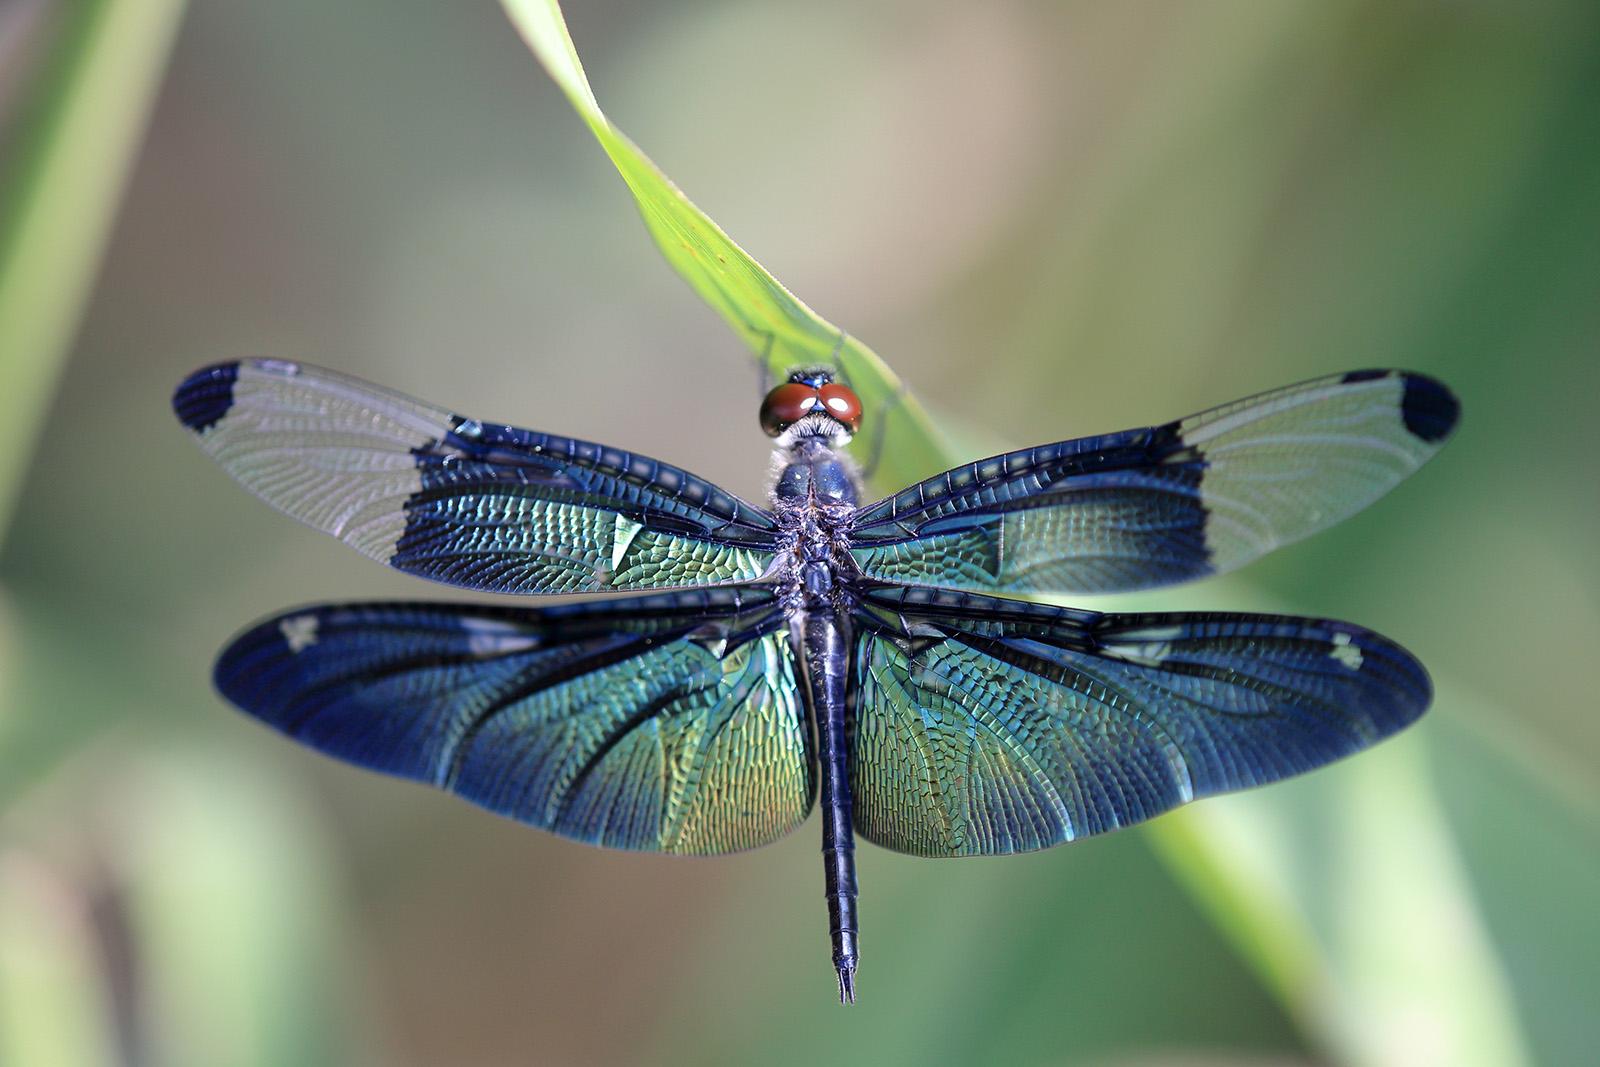 Dragonfly HD wallpapers, Desktop wallpaper - most viewed